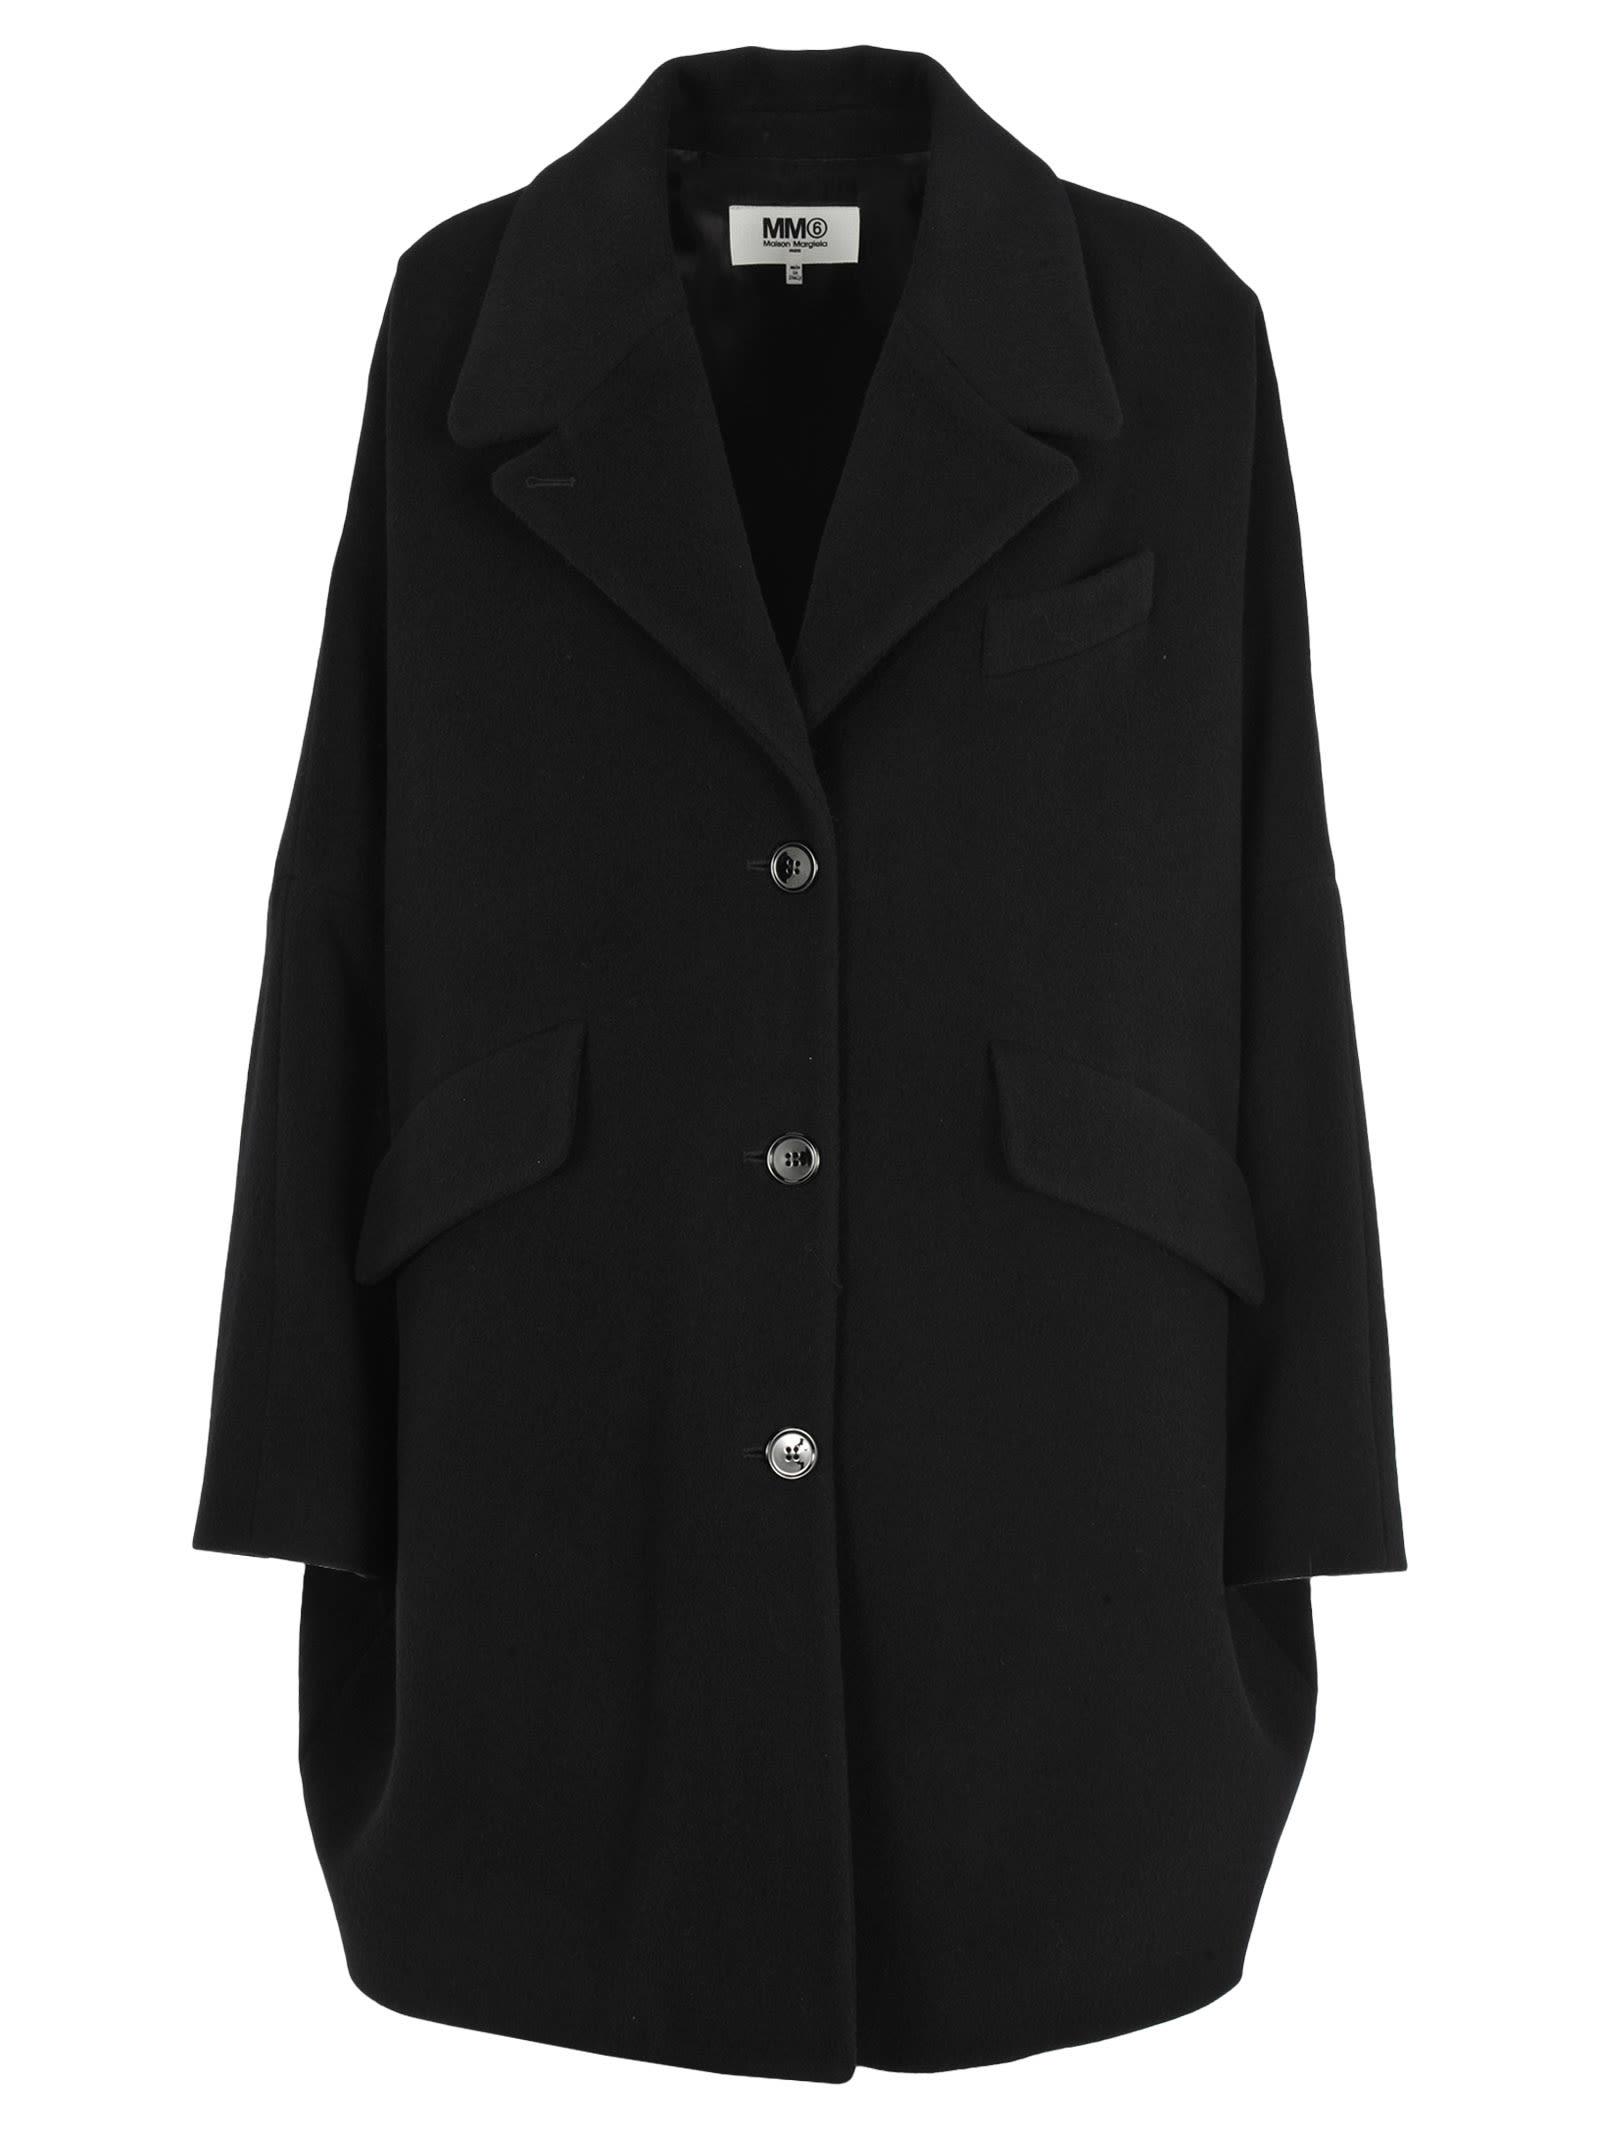 Photo of  Mm6 Oversize Coat- shop MM6 Maison Margiela jackets online sales